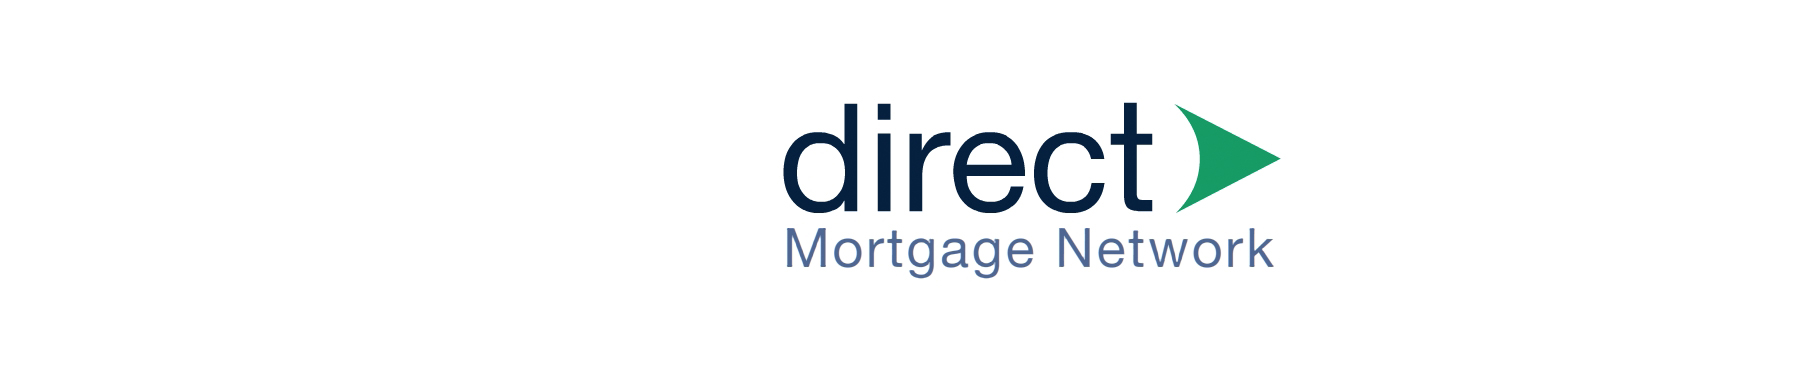 direct mortgage.jpg